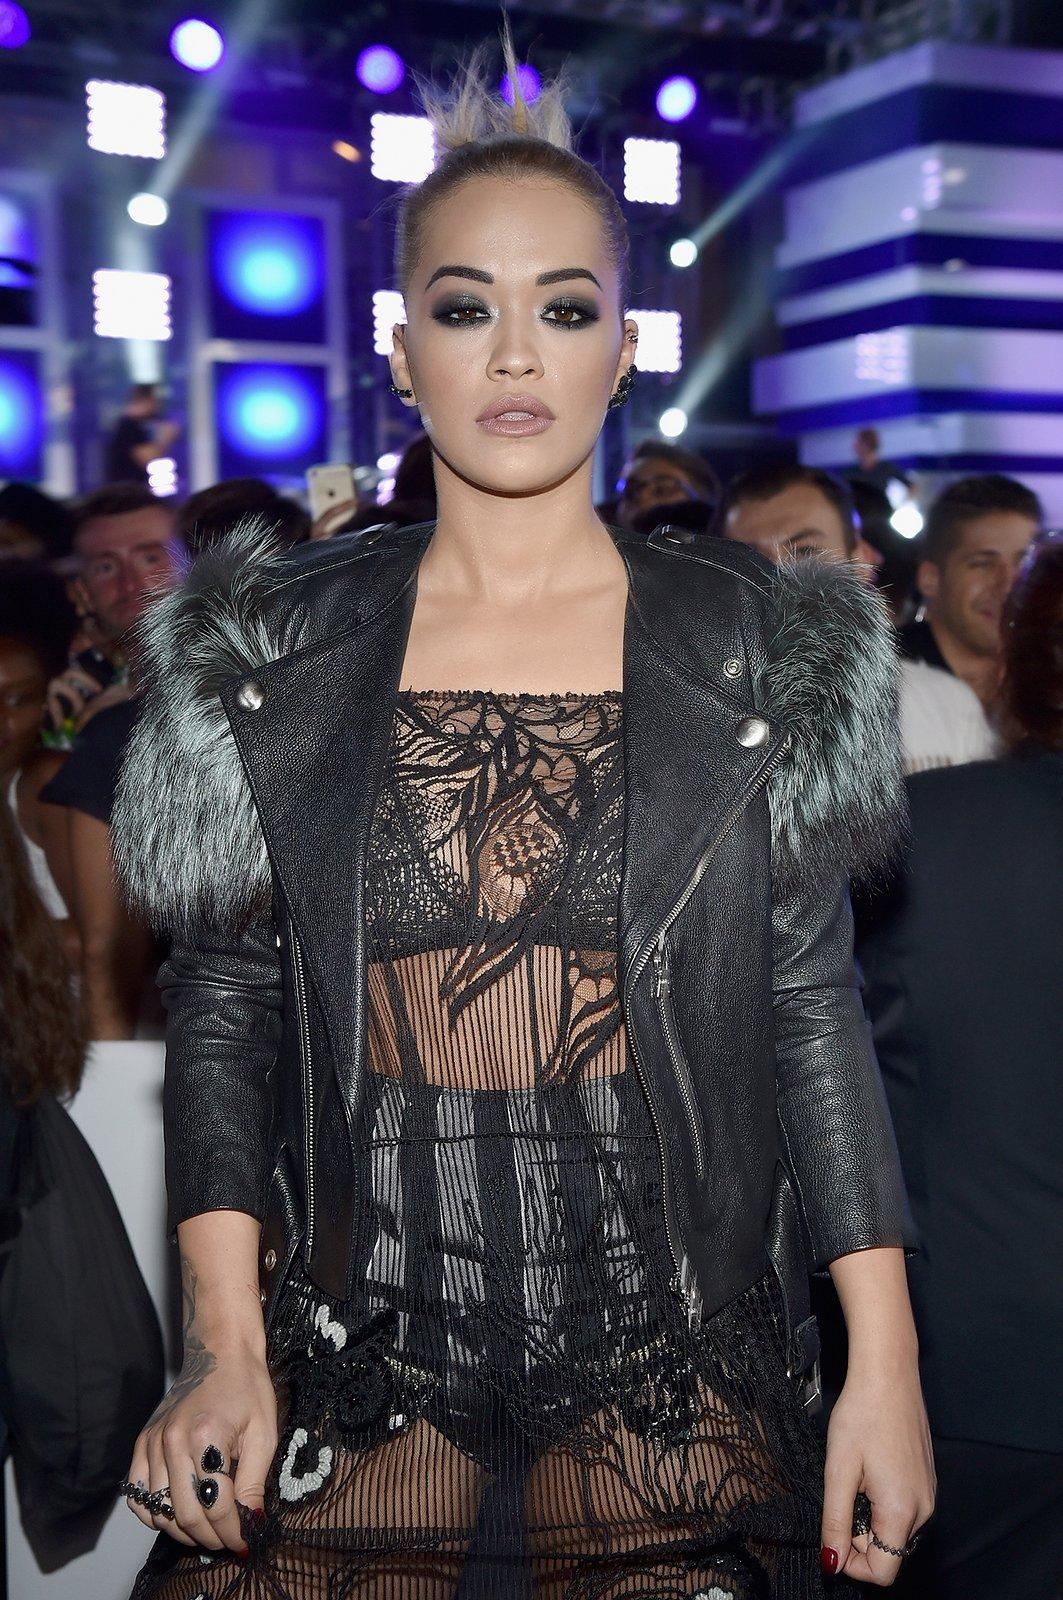 Rita Ora slicked updo hairstyles VMA 2016